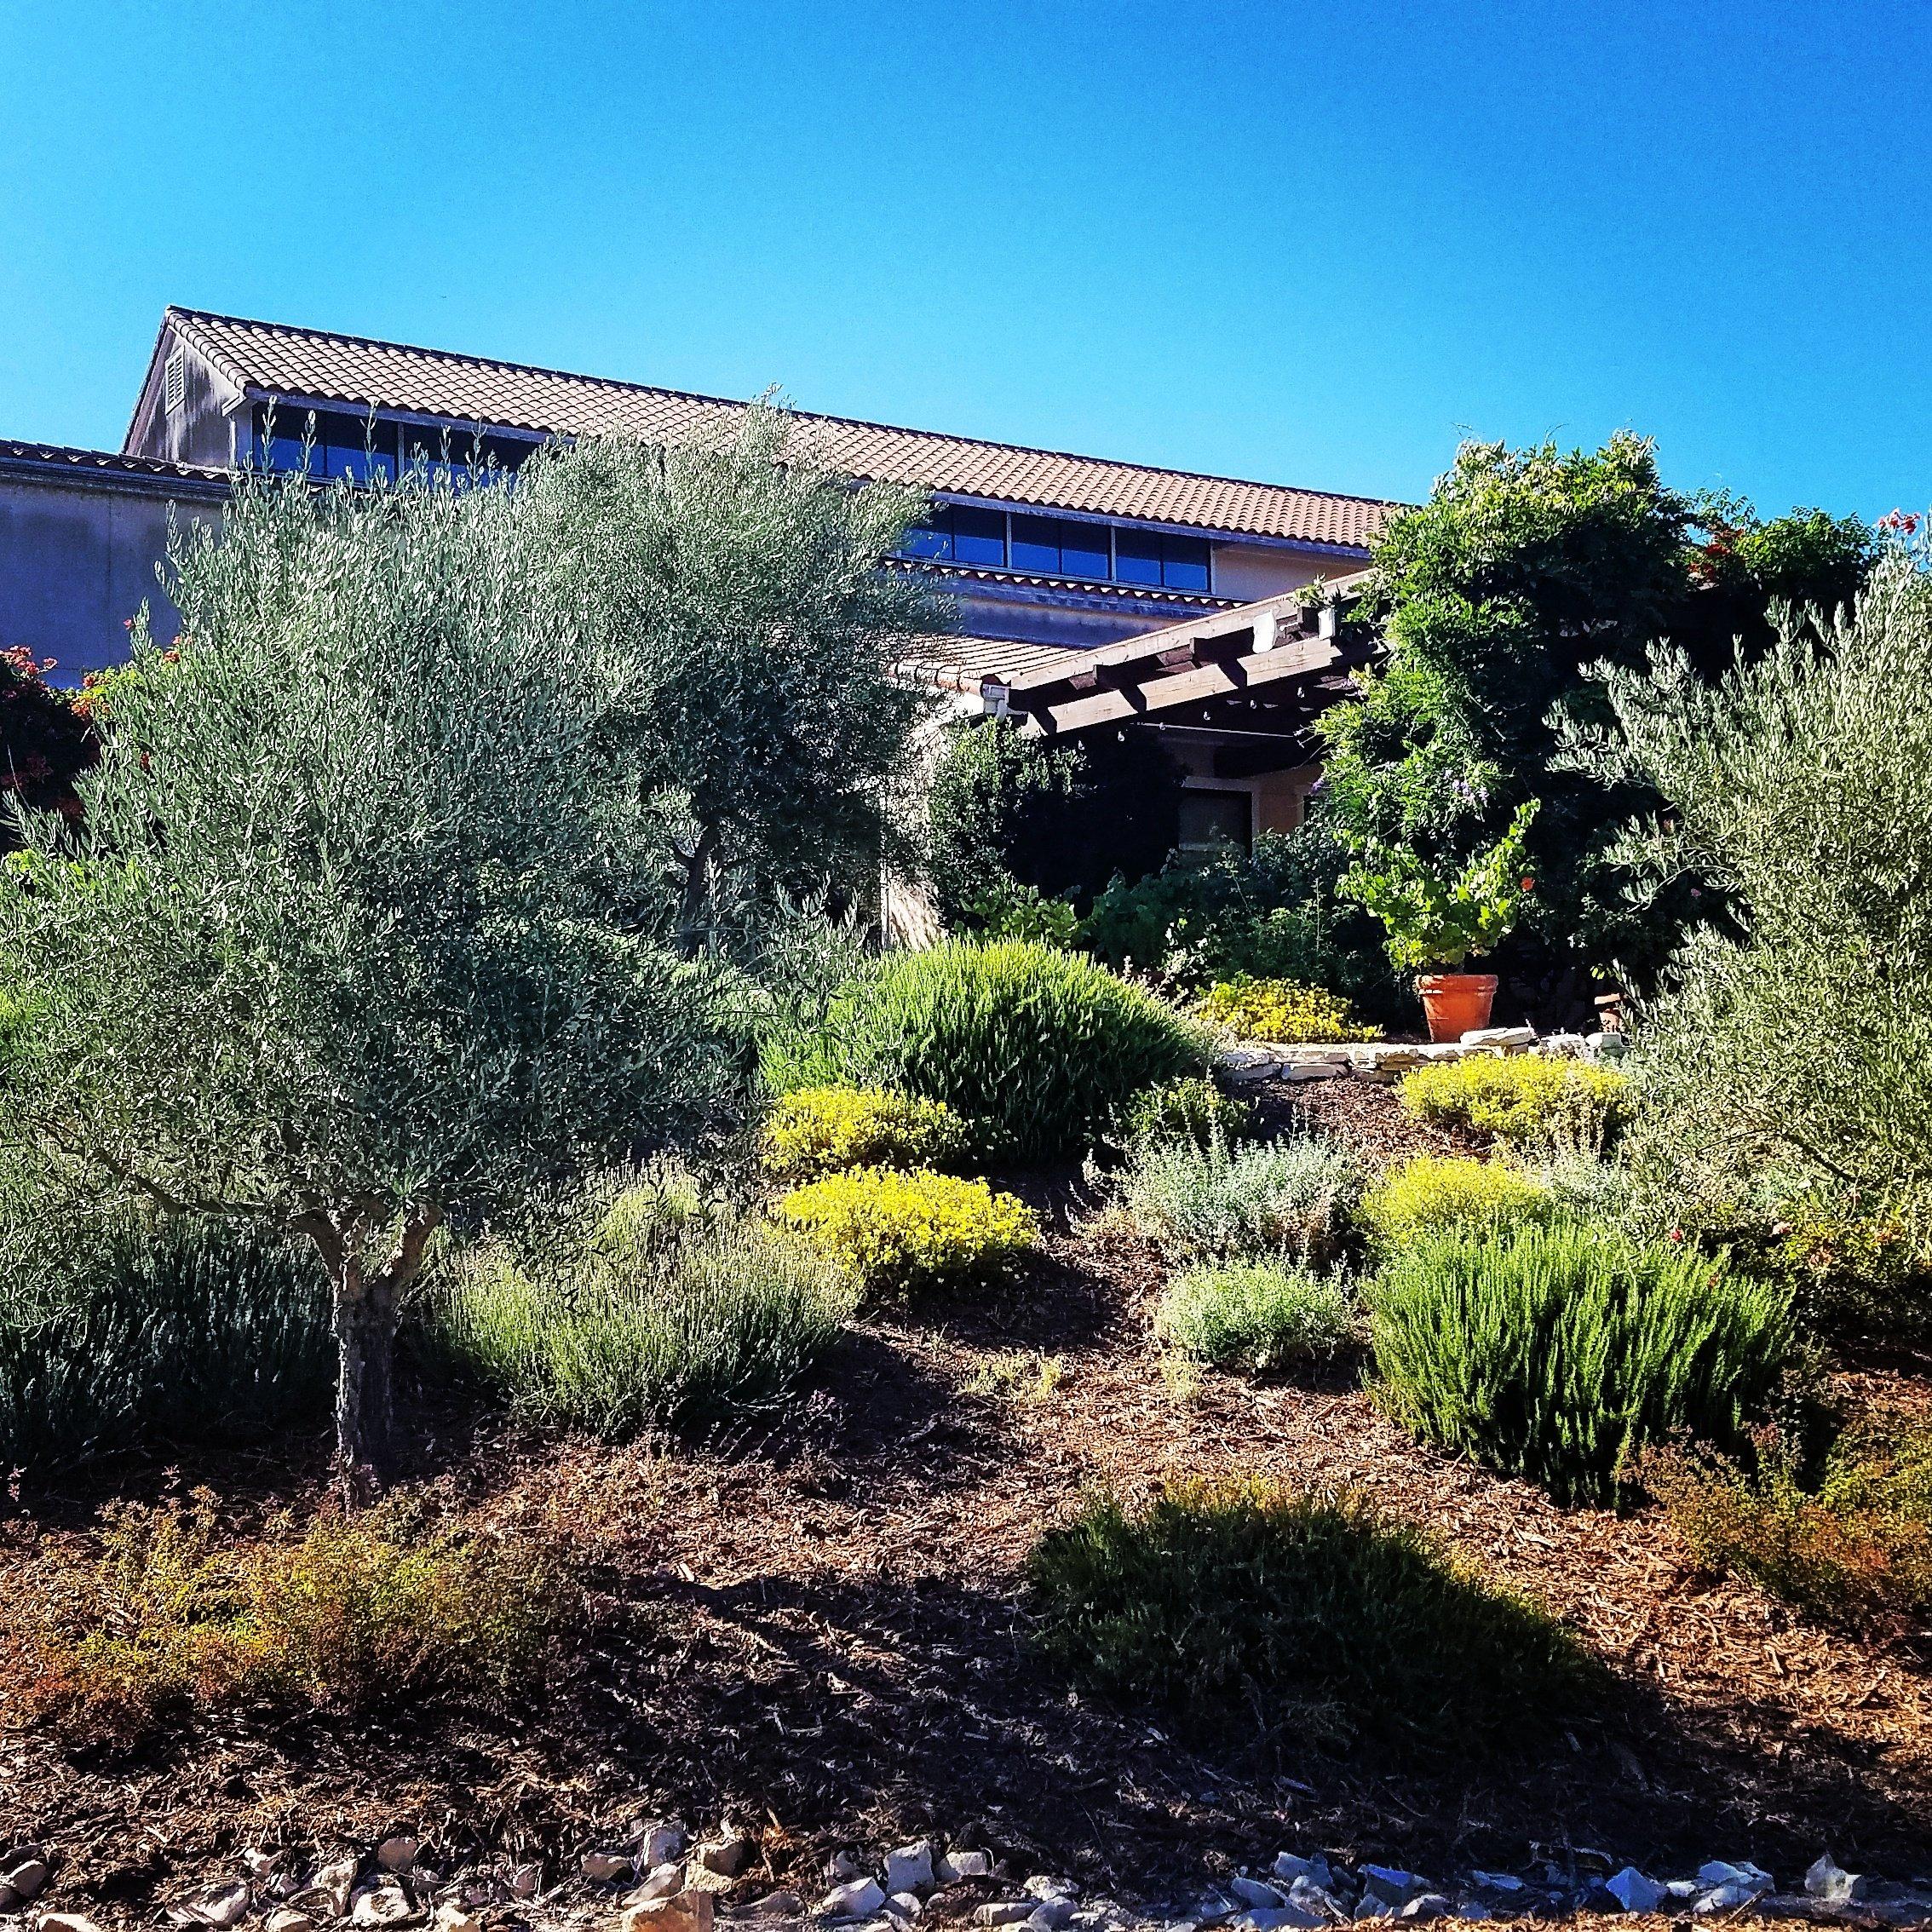 Tablas Creek Vineyard Winery in Paso Robles Adelaida AVA where they recently added Regenerative Organic Certification